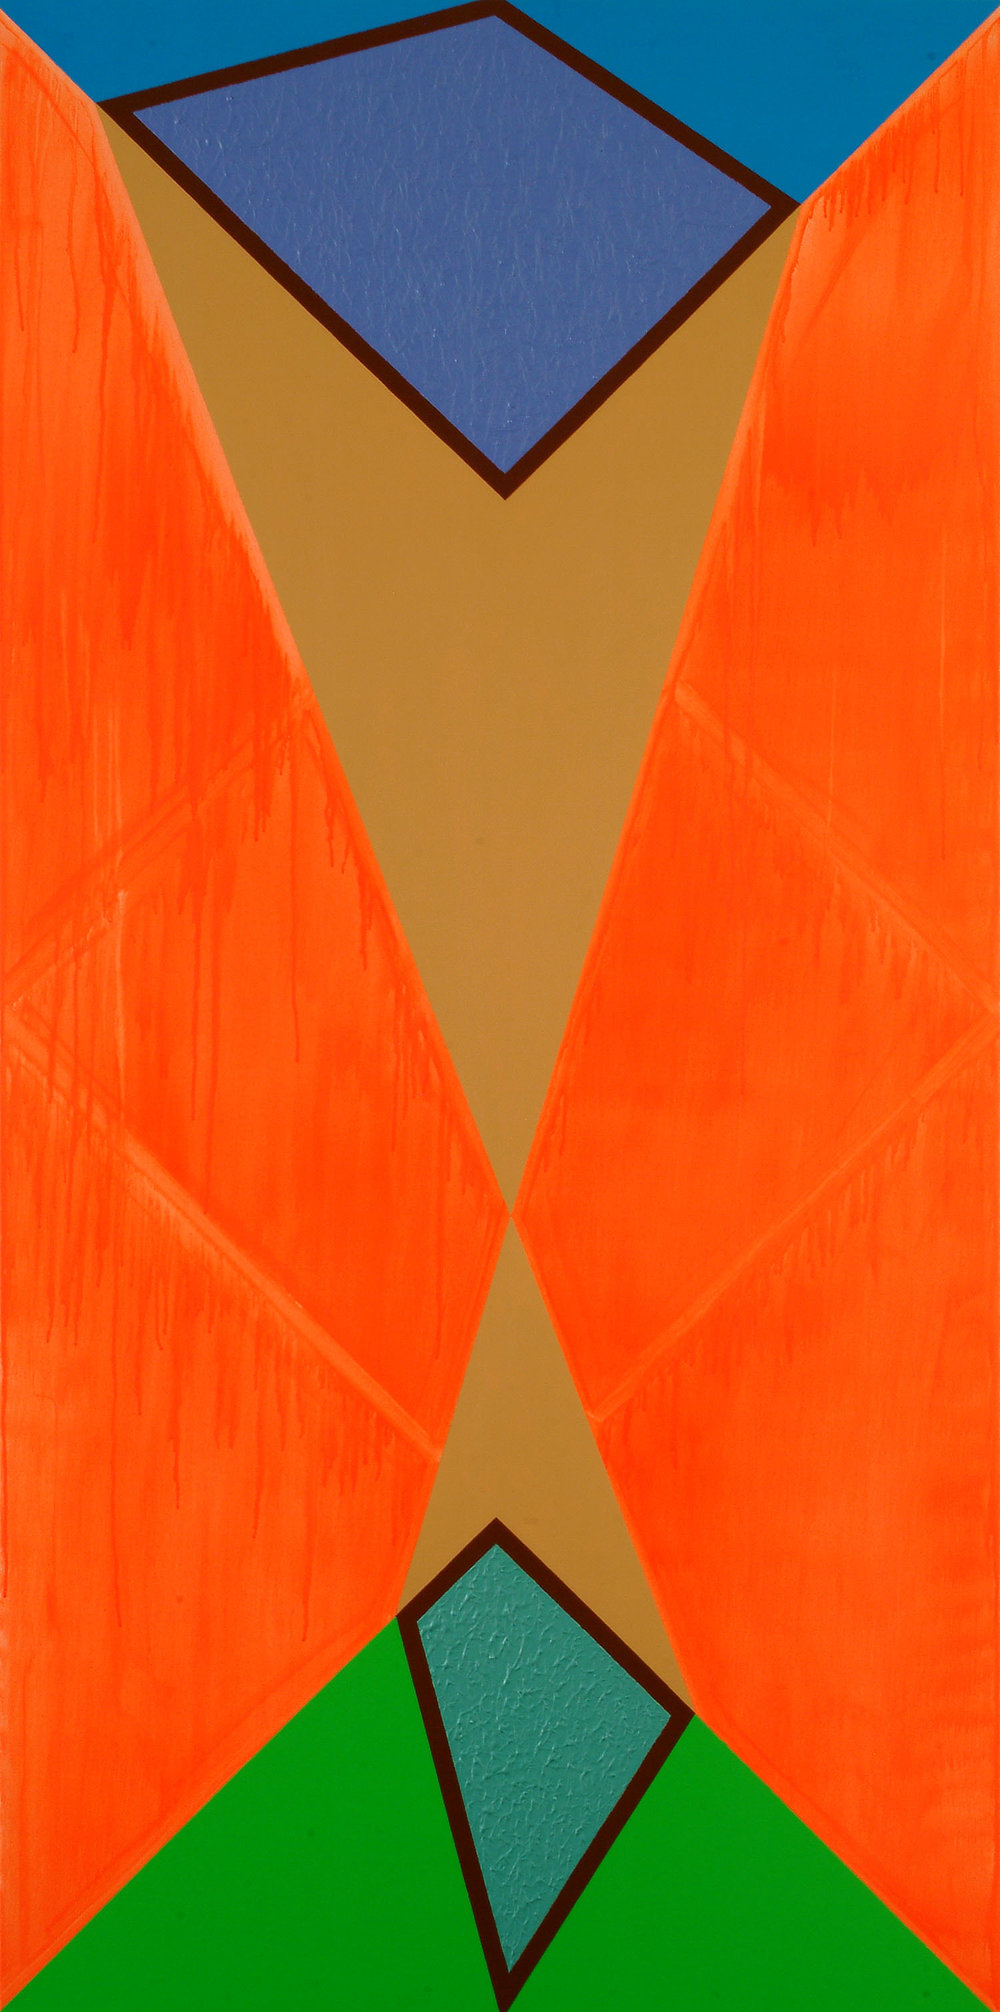 Bild-44 (Die Projektion) | Acryl auf Leinwand | 2007 | 200 x 100 cm